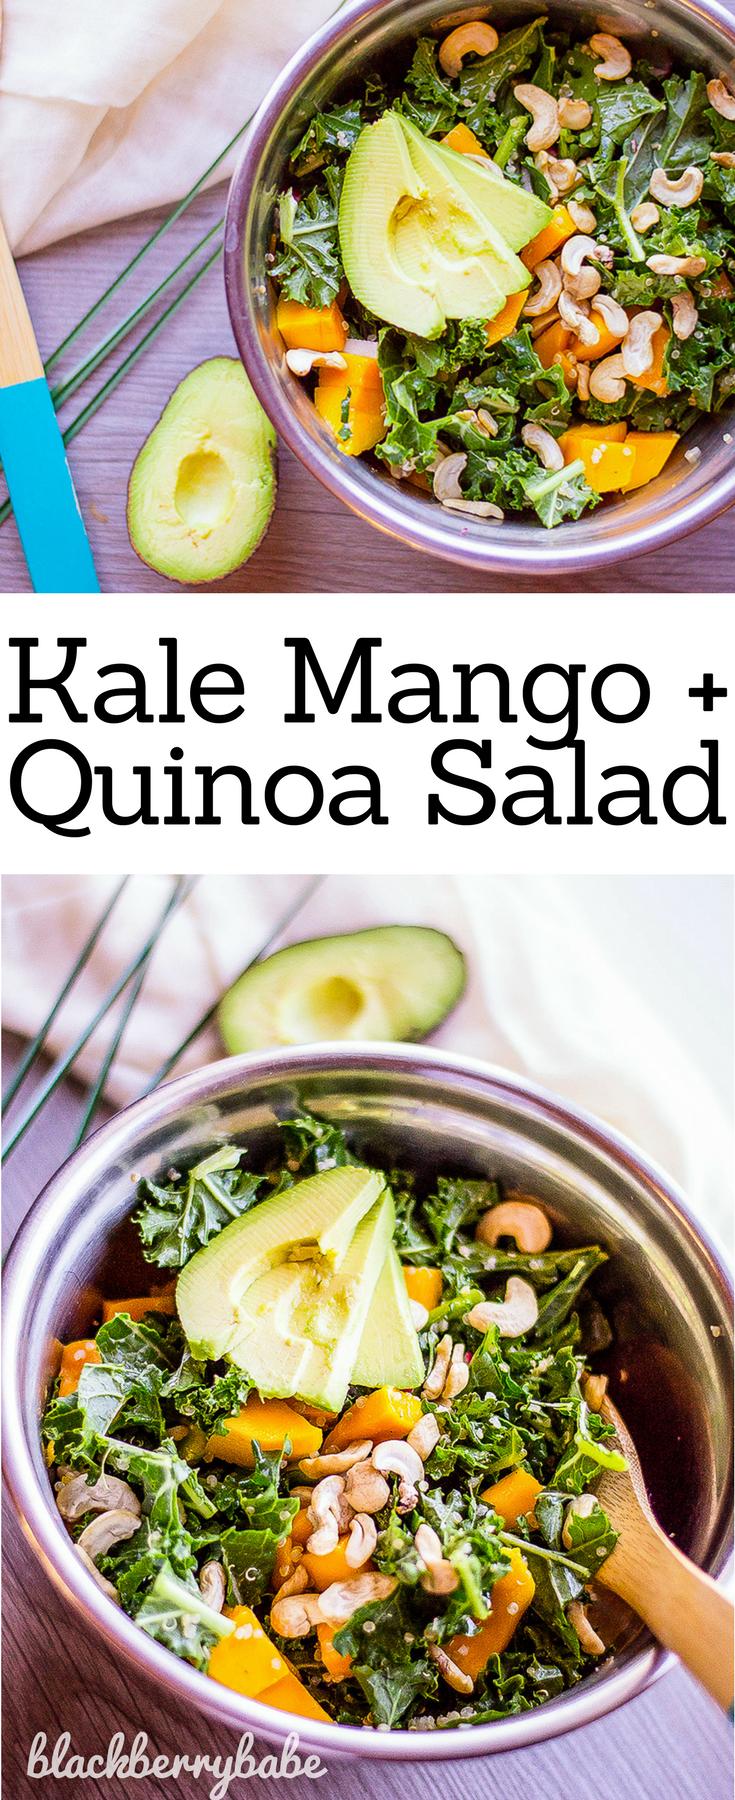 Kale Mango And Quinoa Salad Vegan Recipe Vegetarian